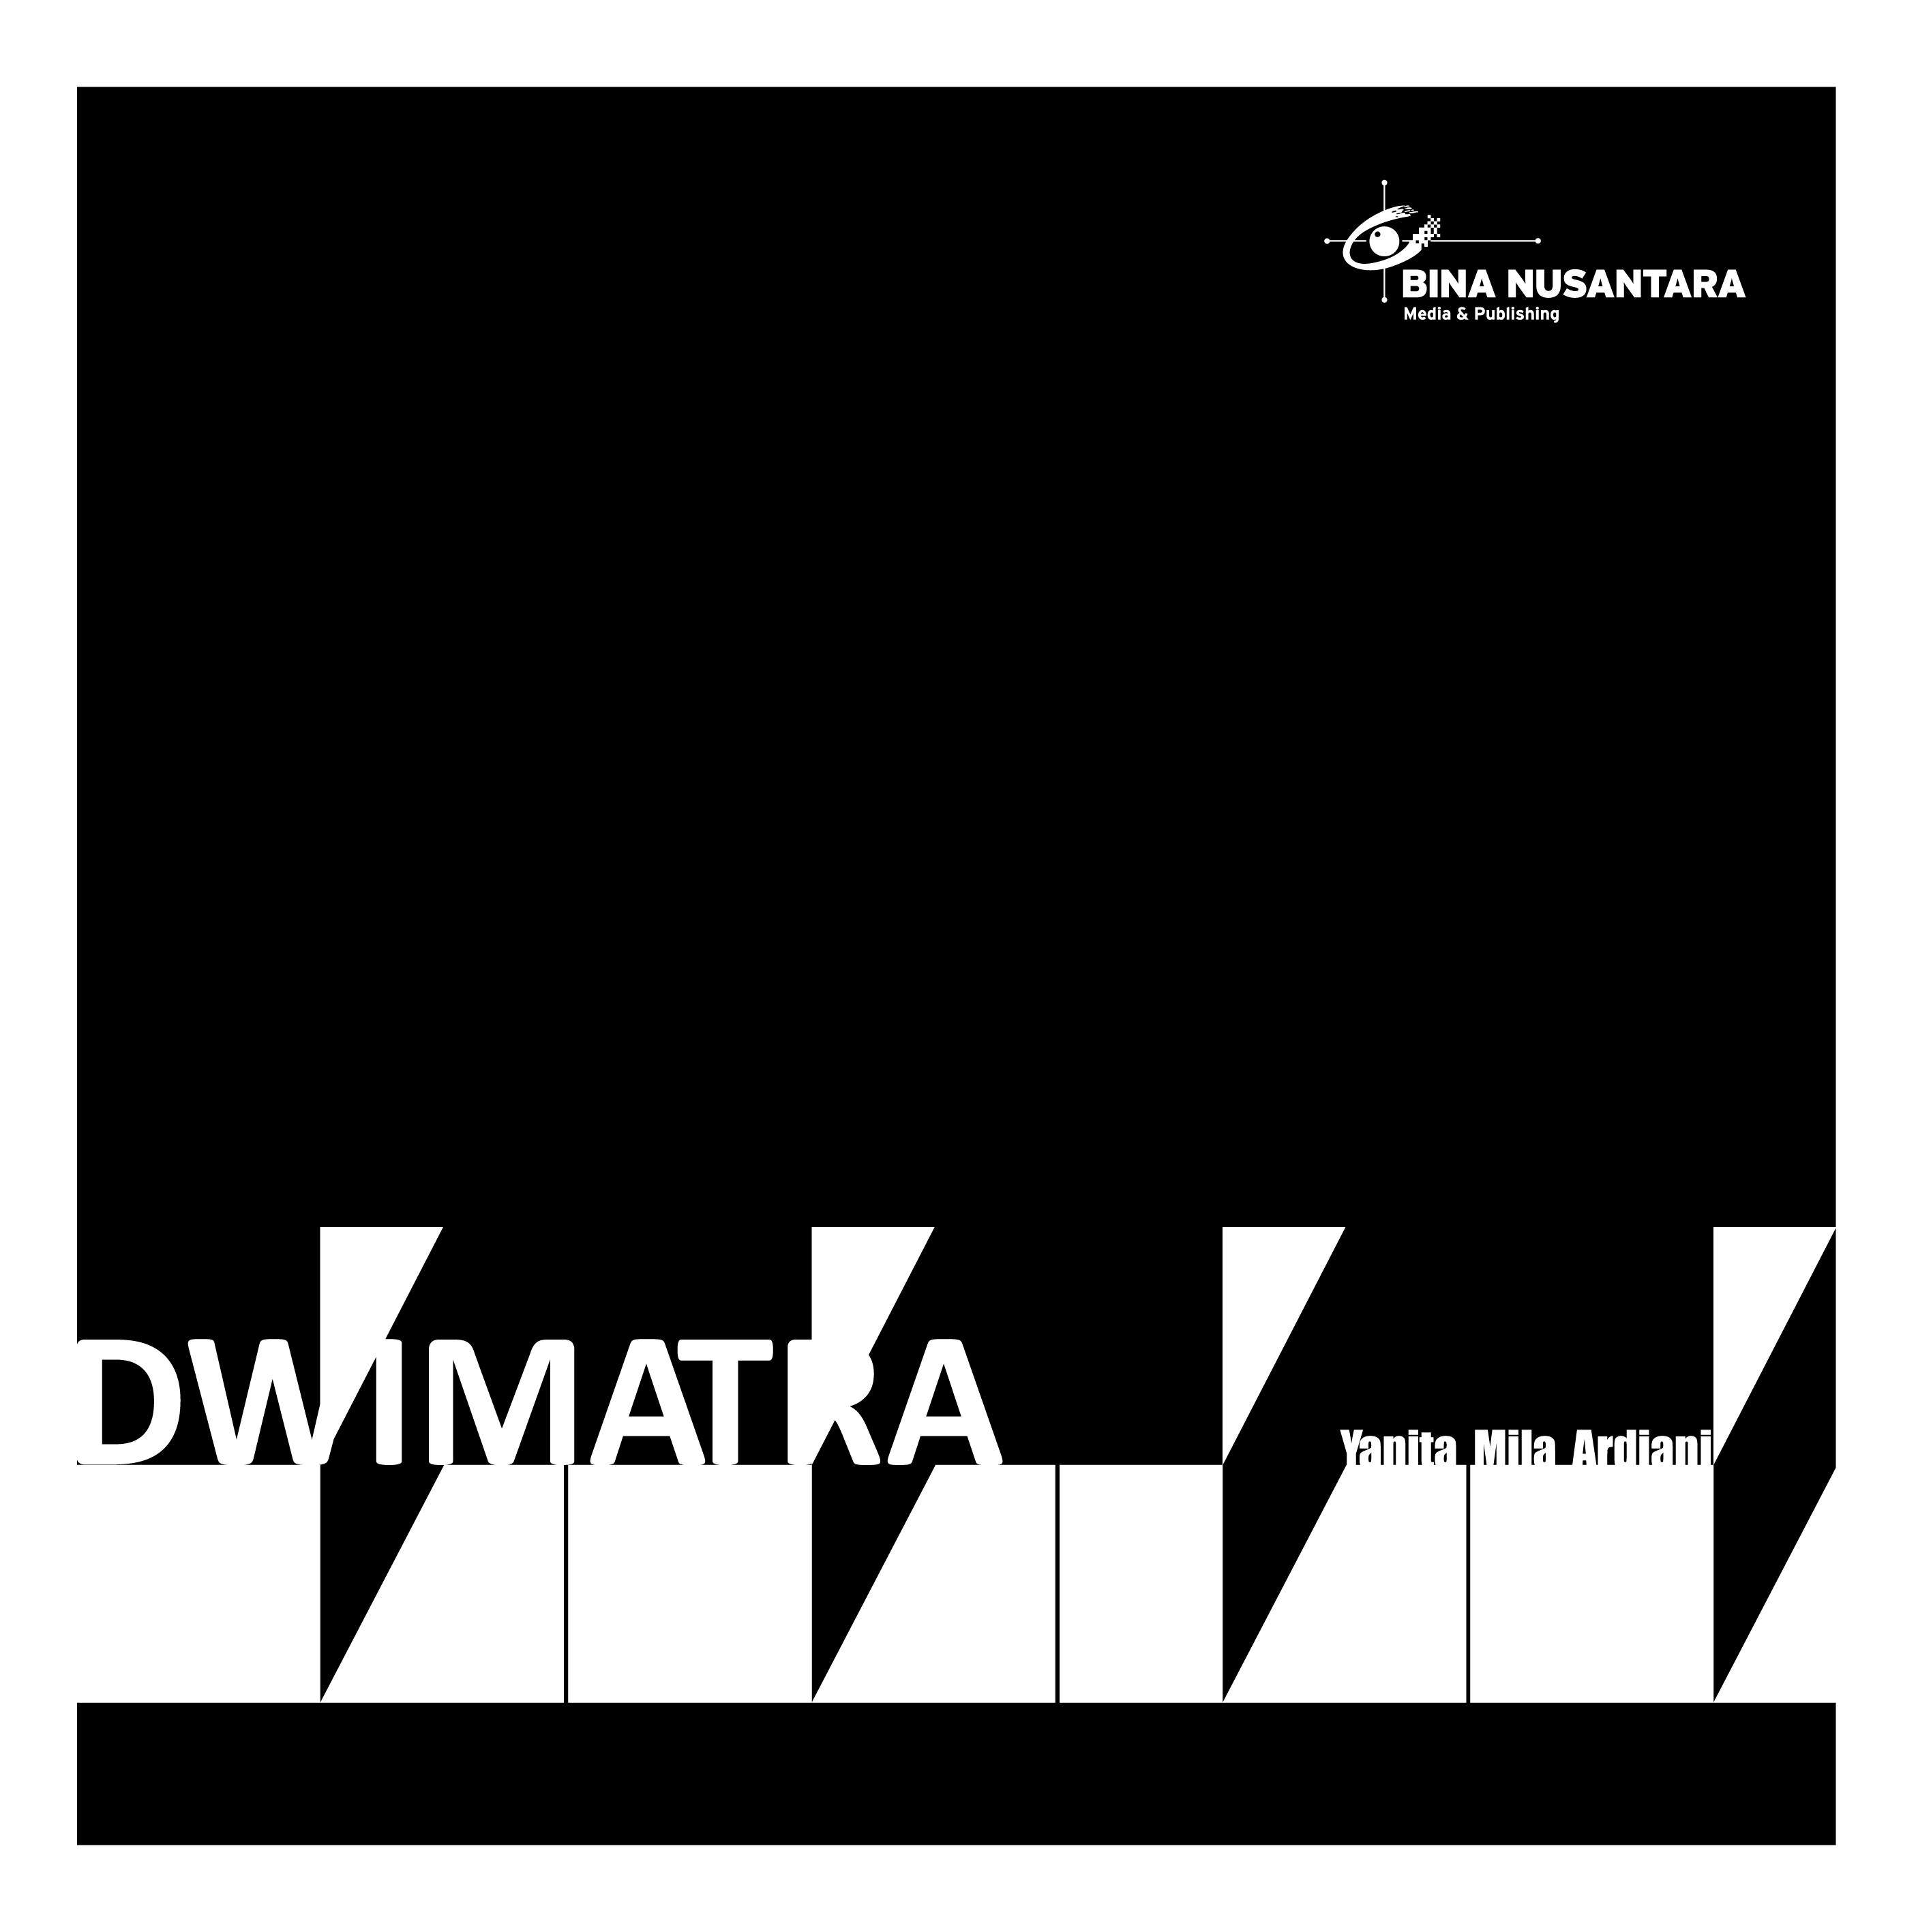 DWIMATRA